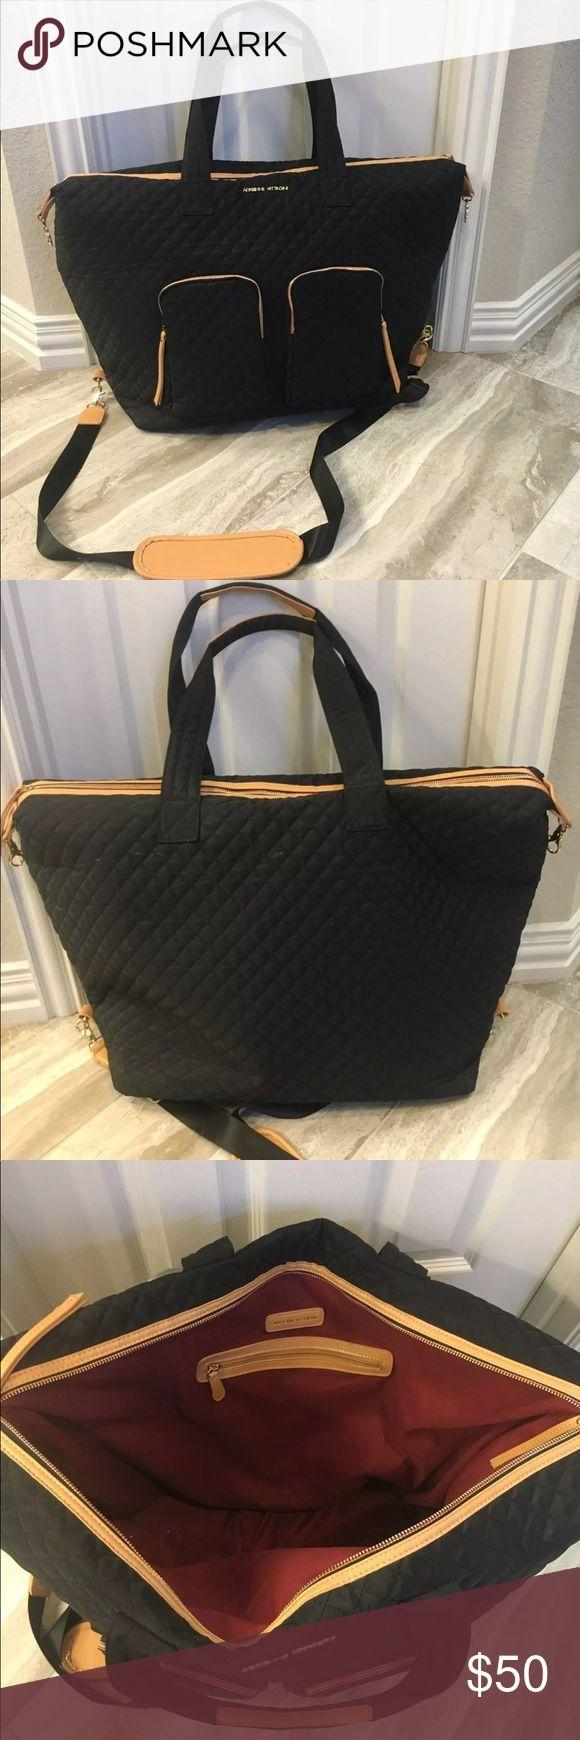 Adrienne vittadini black quilted weekender HUGE Adrienne Vittadini black quilted weekender travel bag. Used once. Adrienne Vittadini Bags Travel Bags